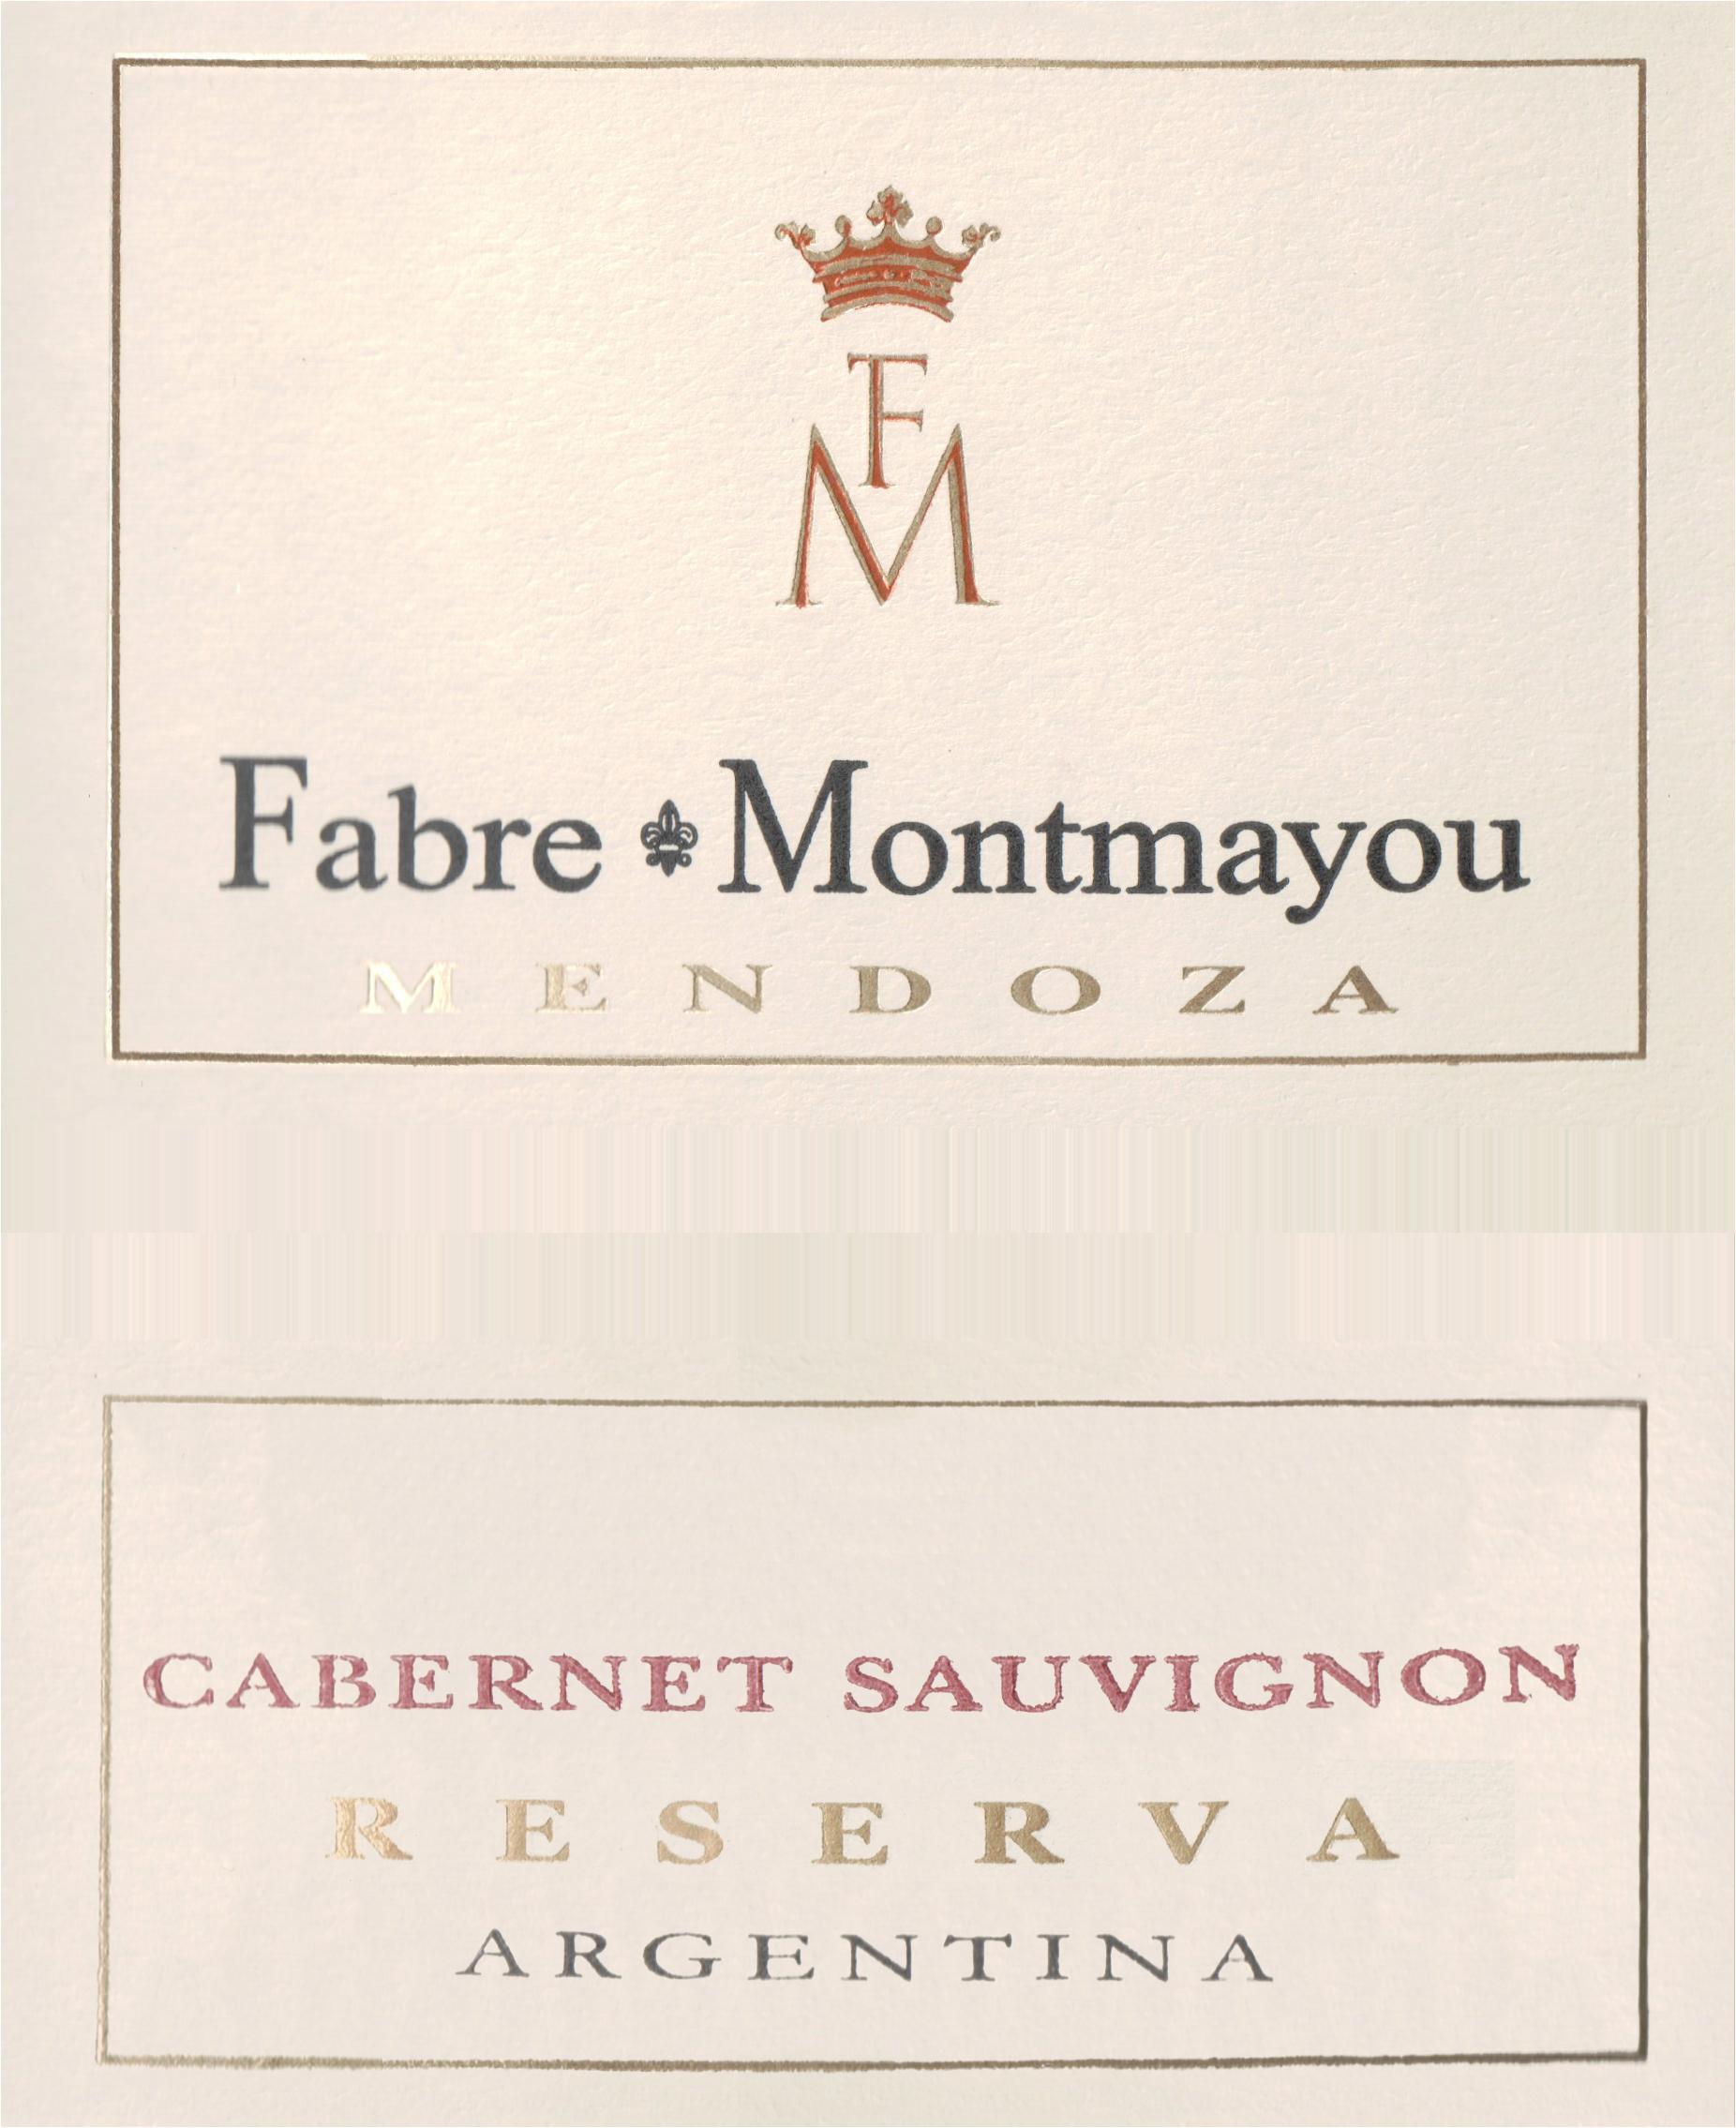 Fabre Montmayou Reserva Cabernet Sauvignon 2018